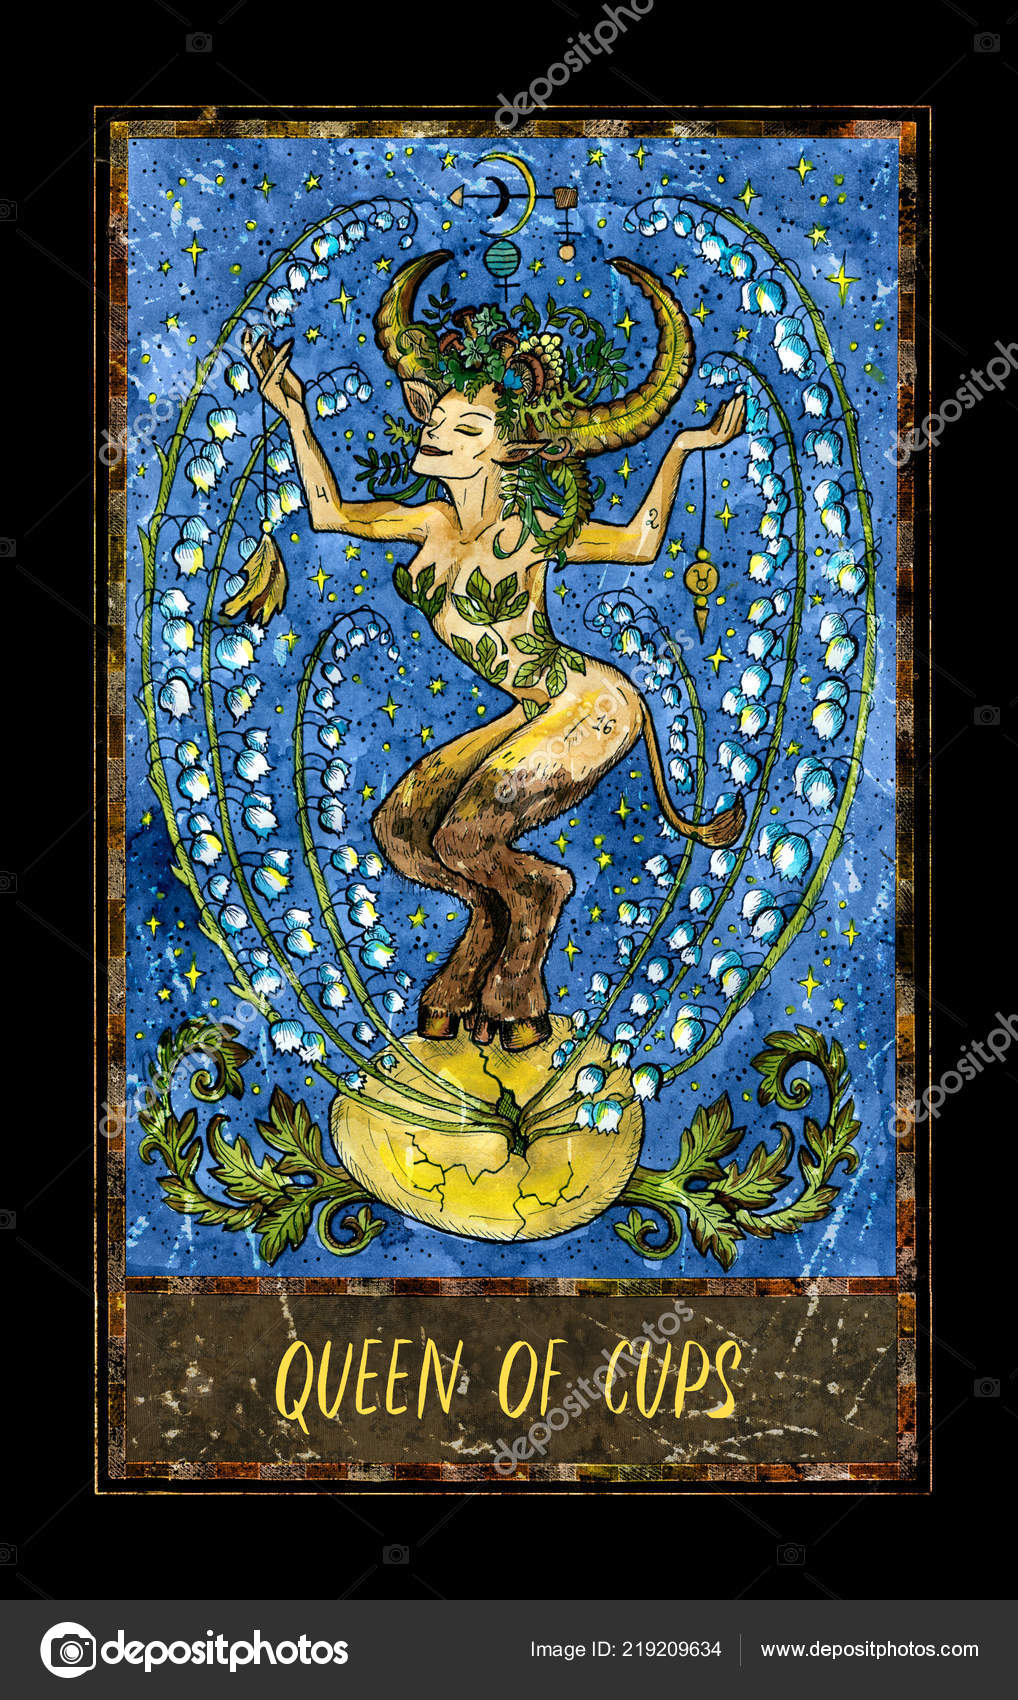 Kralovna Poharu Male Tarotova Karta Arcana Magic Gate Balicek